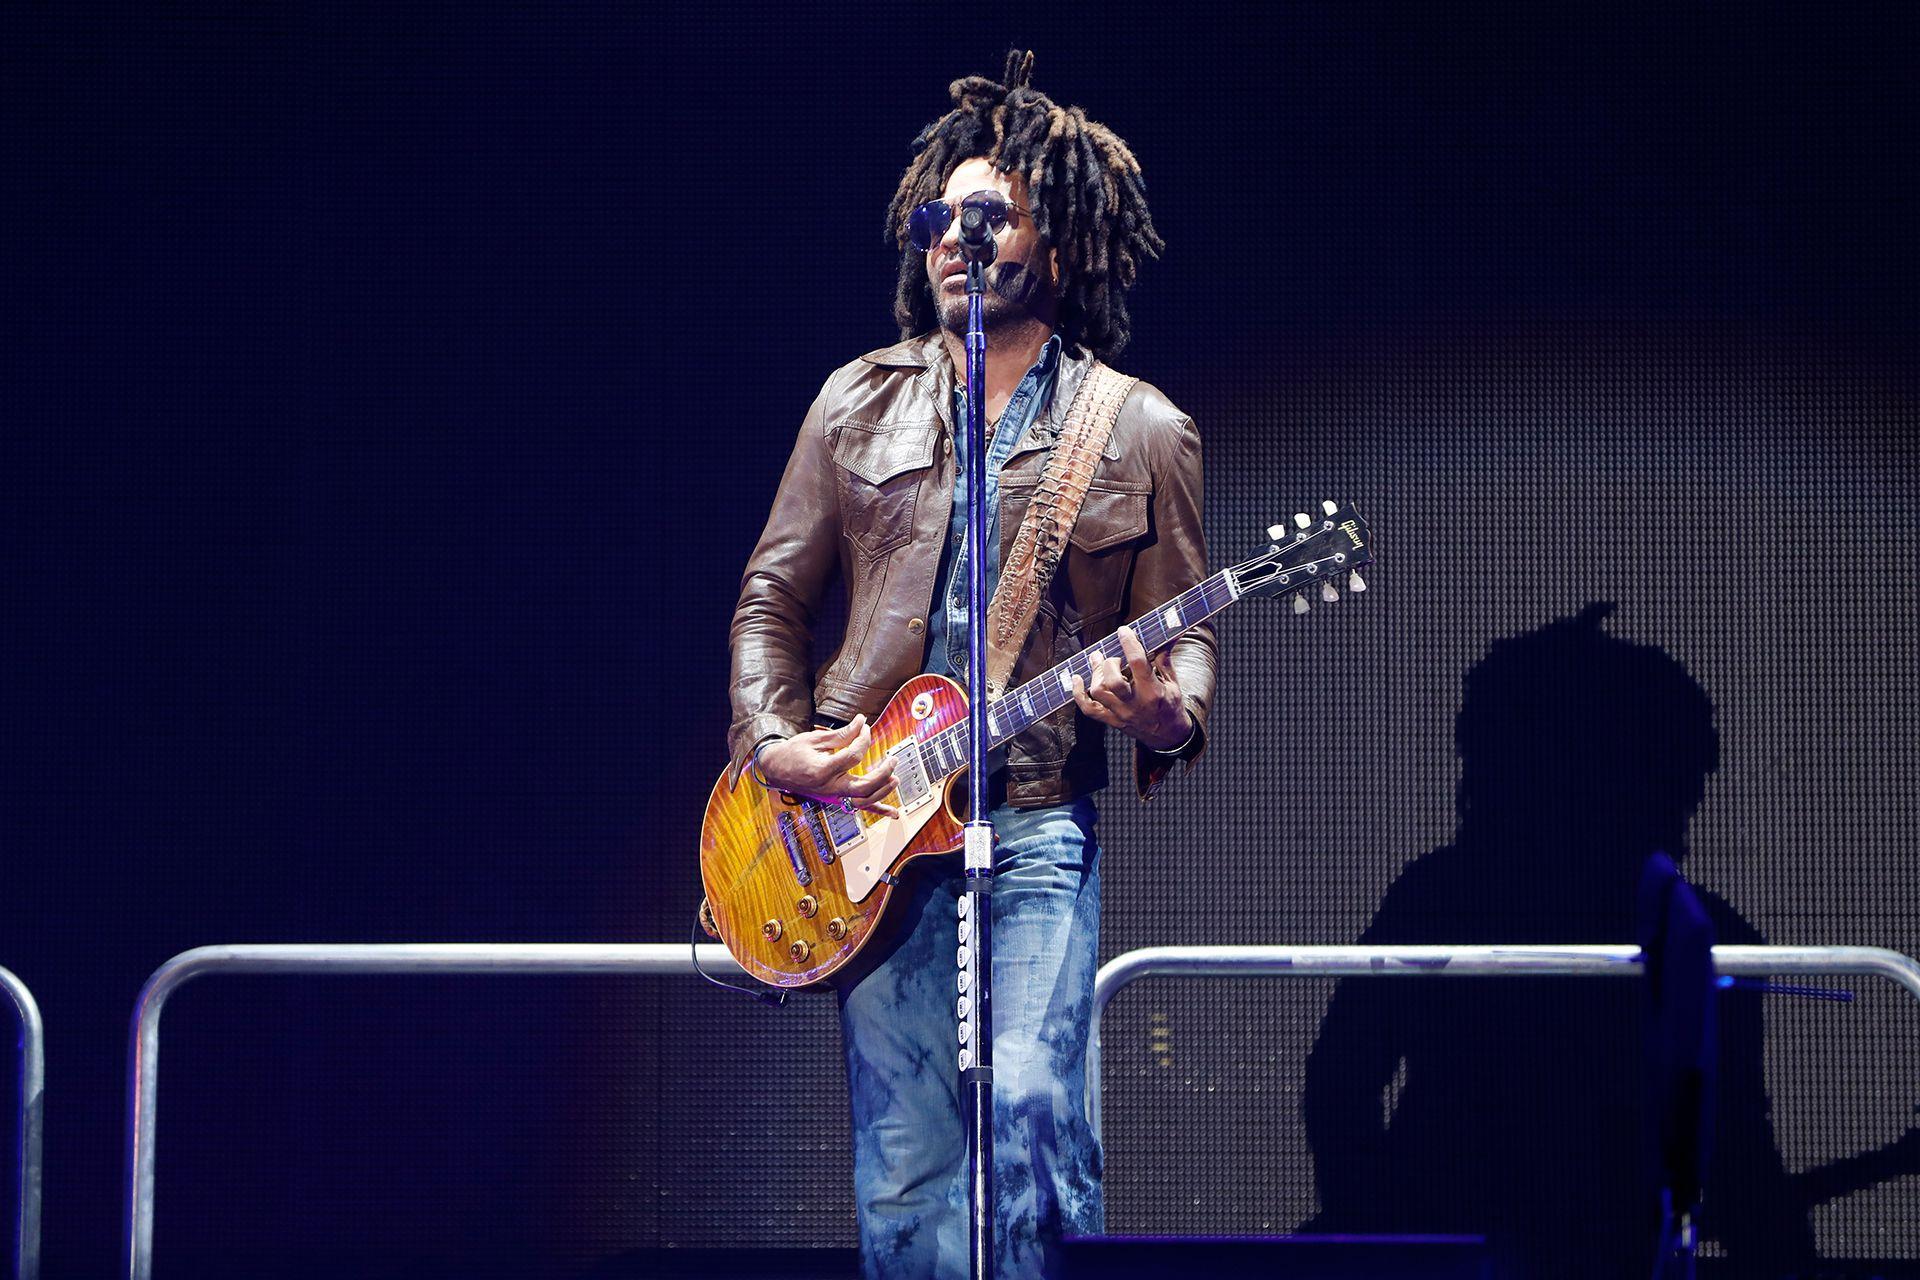 Lenny Kravitz tuvo un incidente con sus pantalones (Chule Valerga)